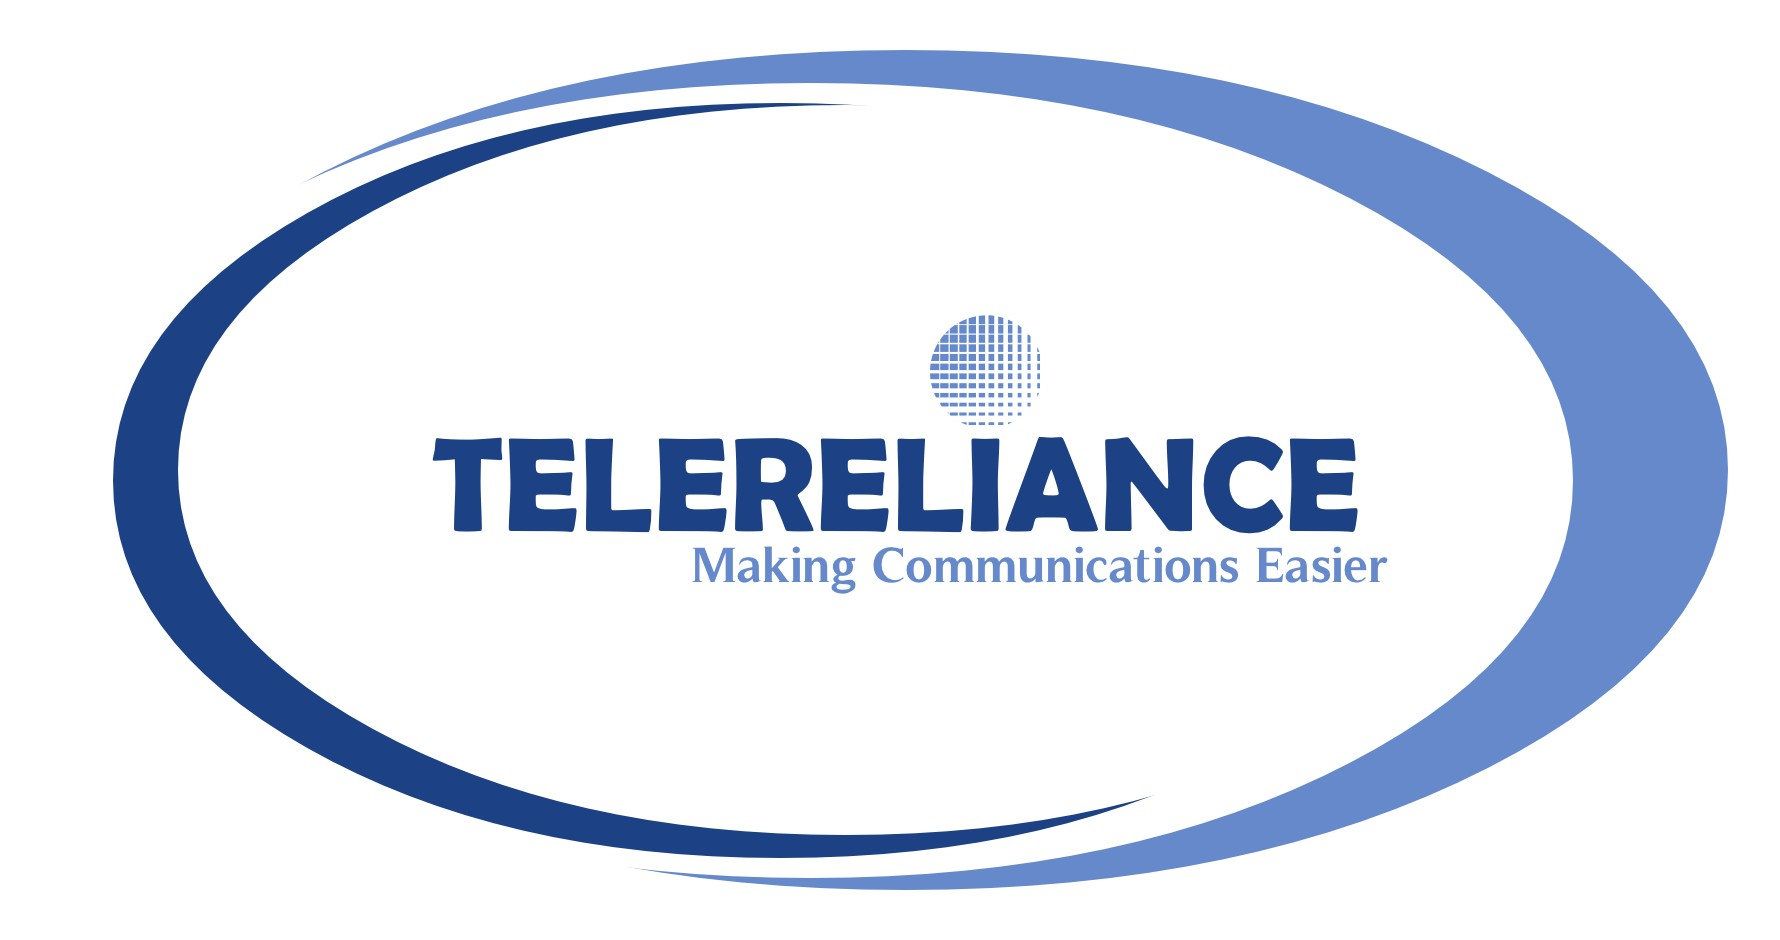 Rich Communication Services Telereliance